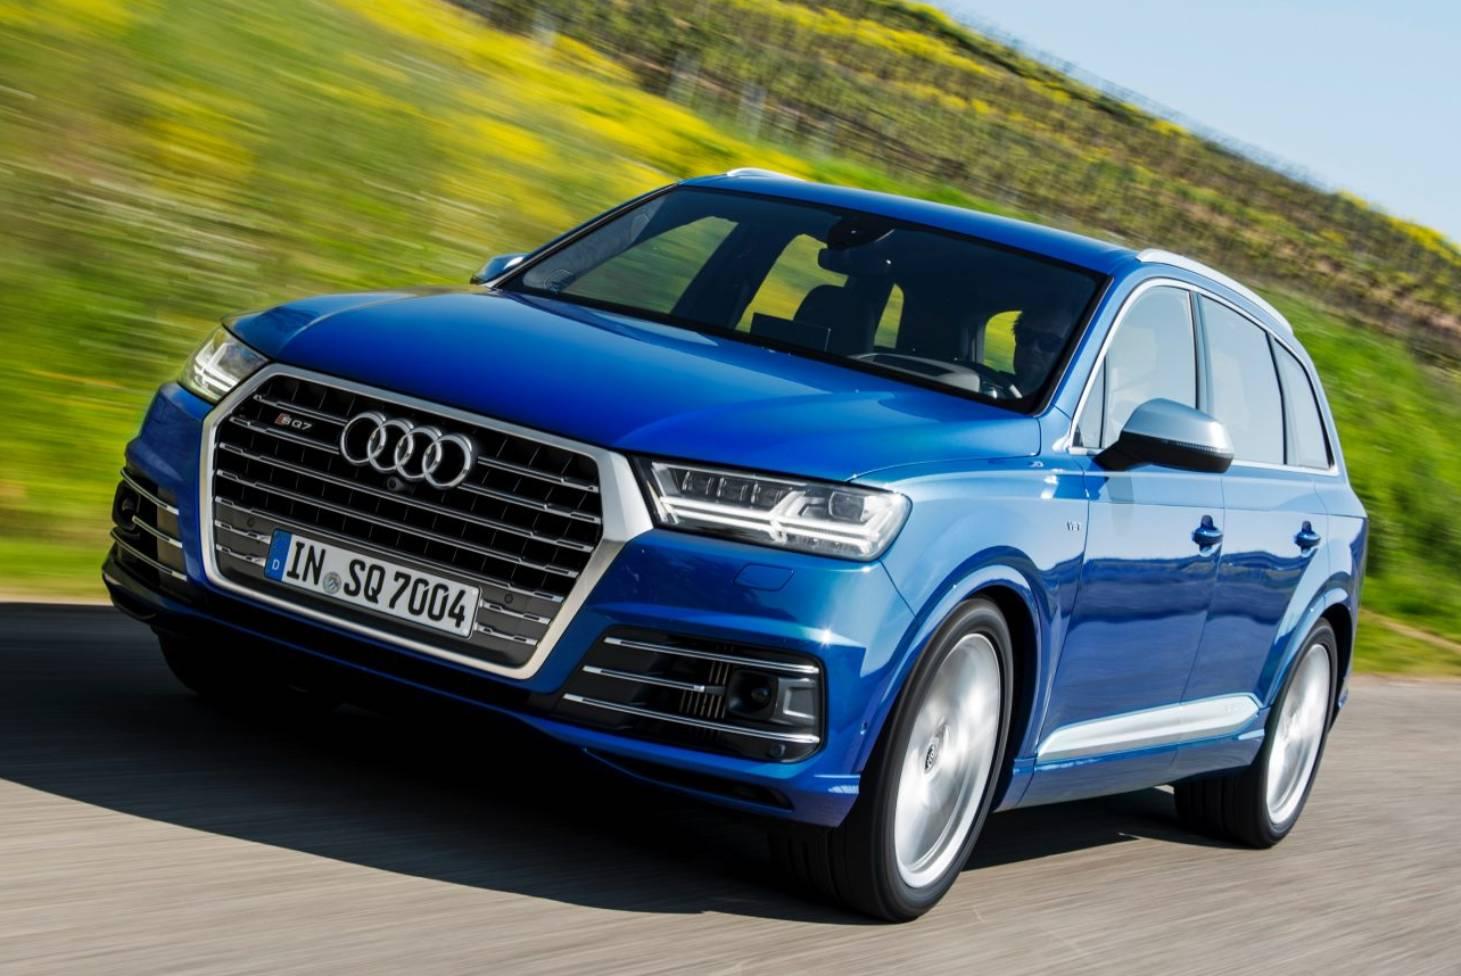 Audi Sq7 Nz >> Audi Sq7 Delivers A New Kind Of Electrifying Performance Stuff Co Nz